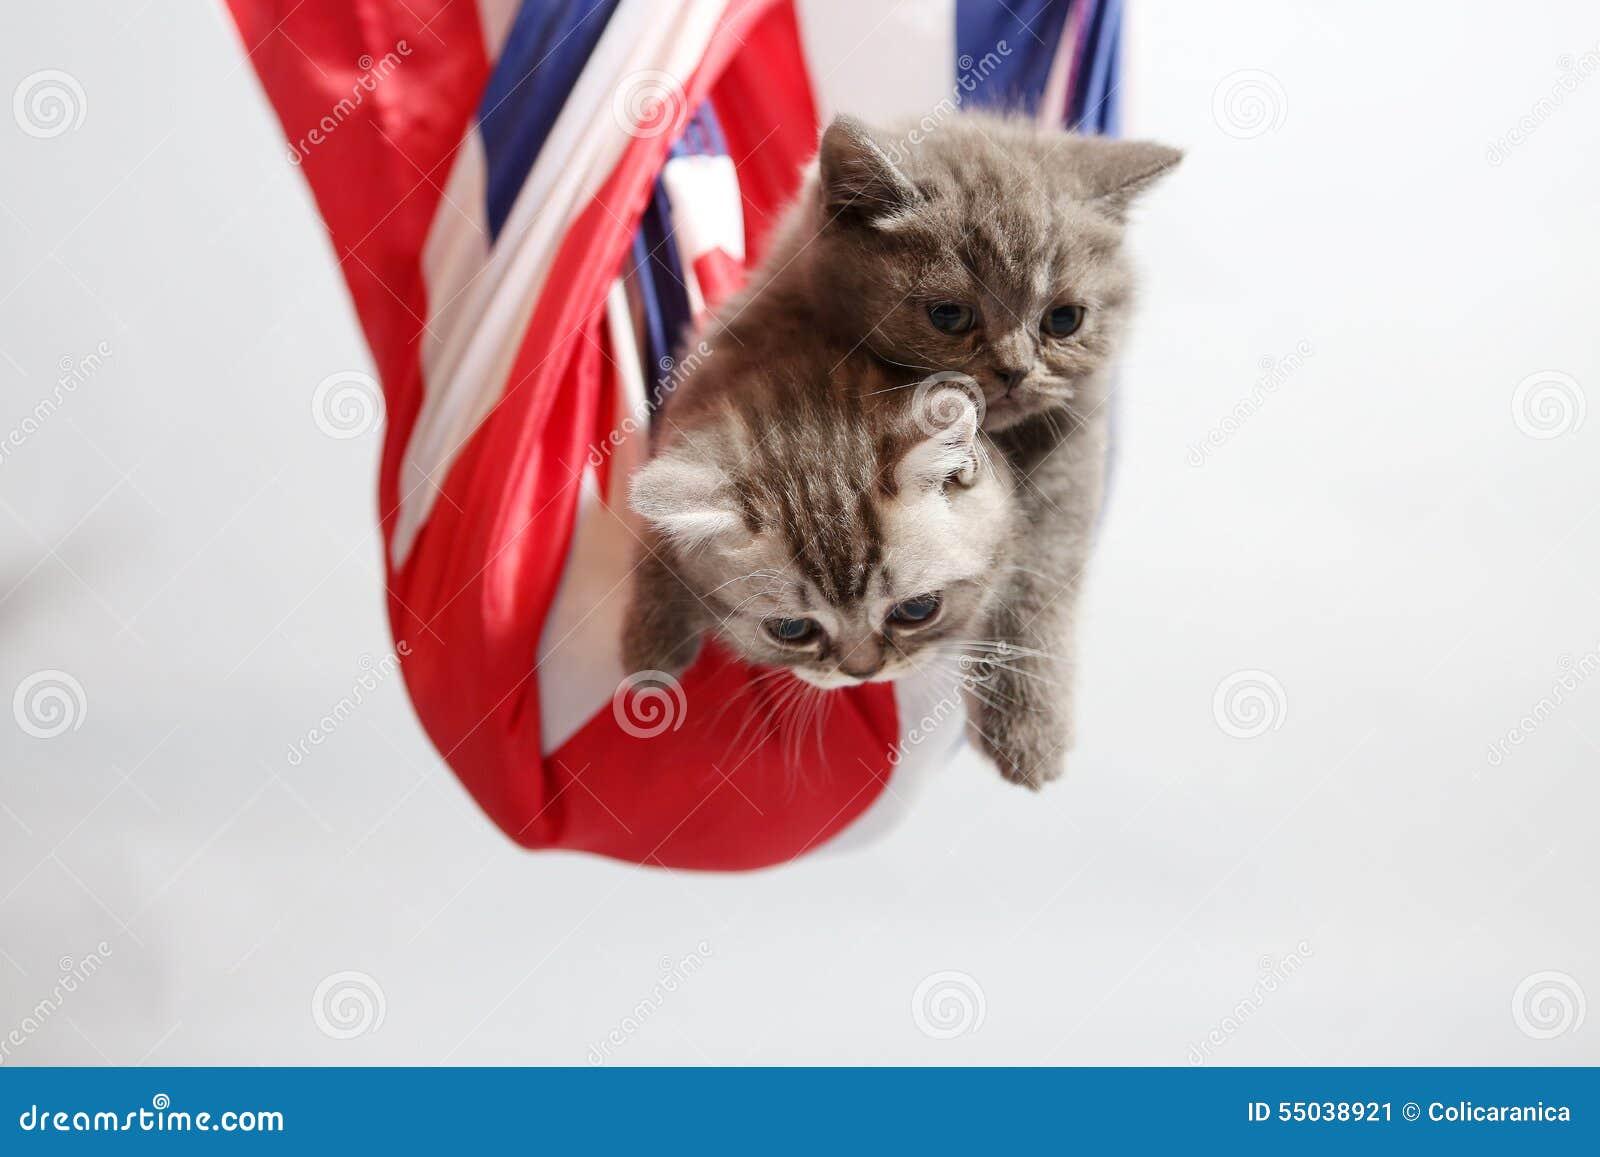 Cute kittens in a sack